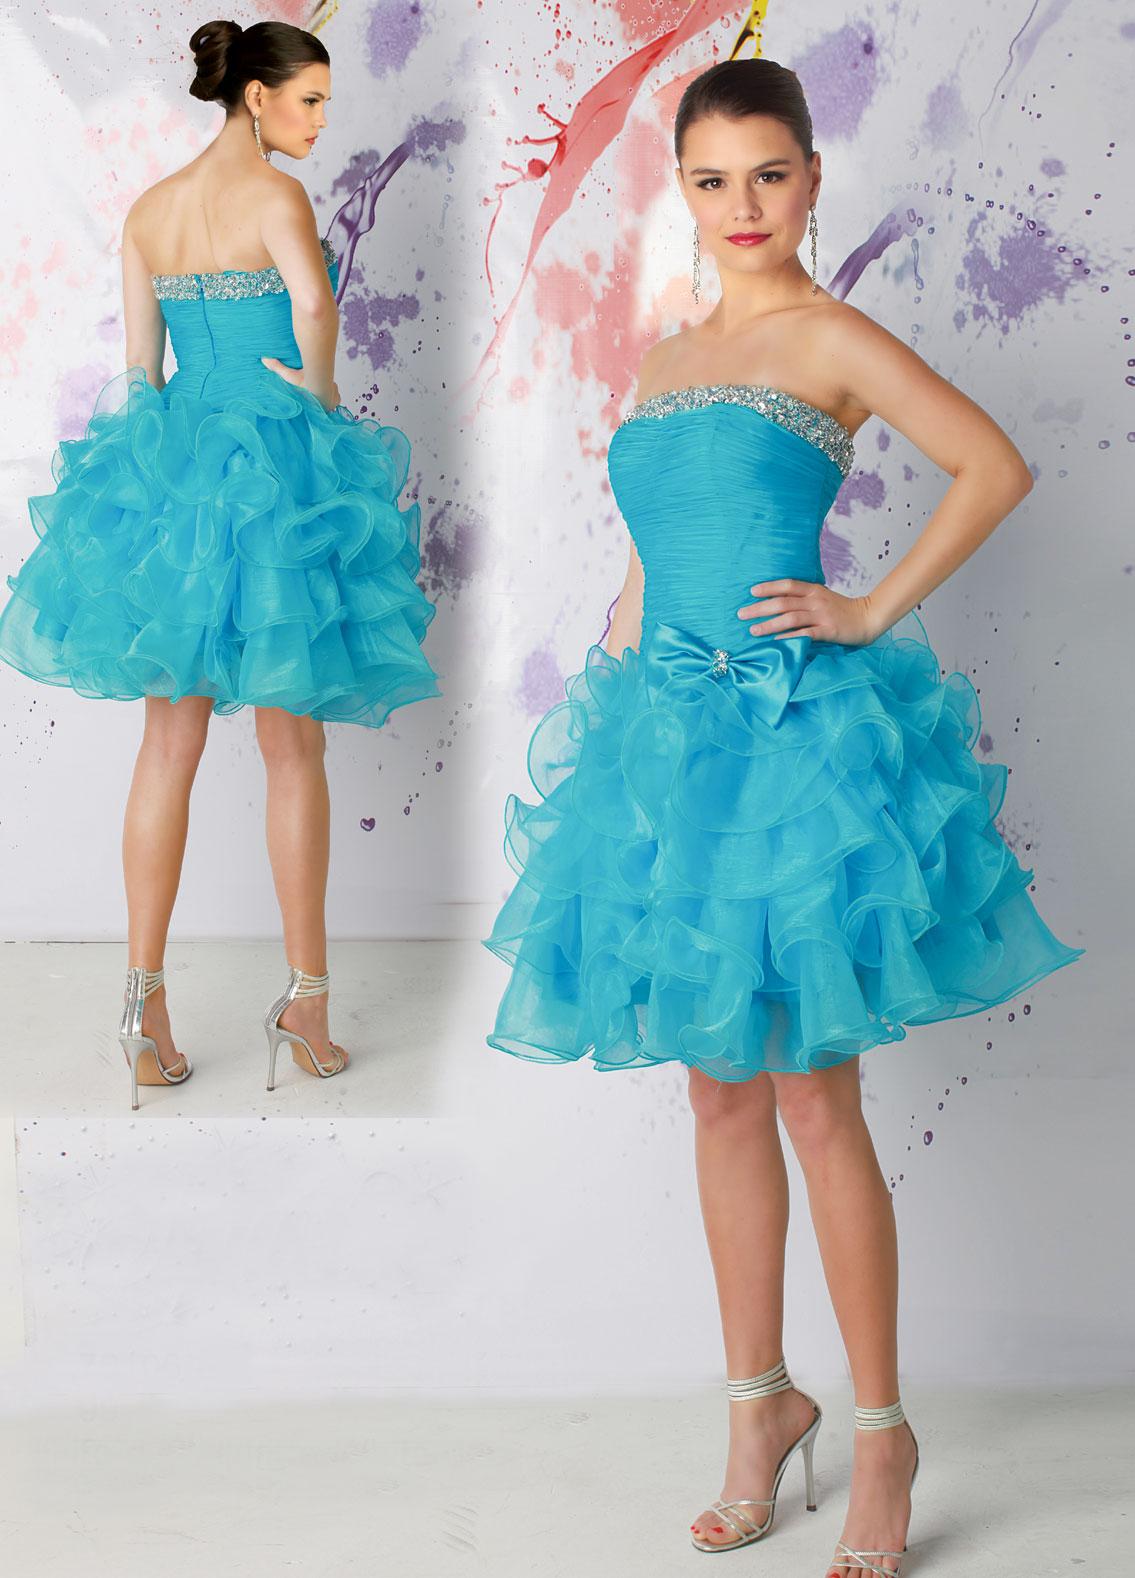 Short Quinceanera Dresses | Dressed Up Girl